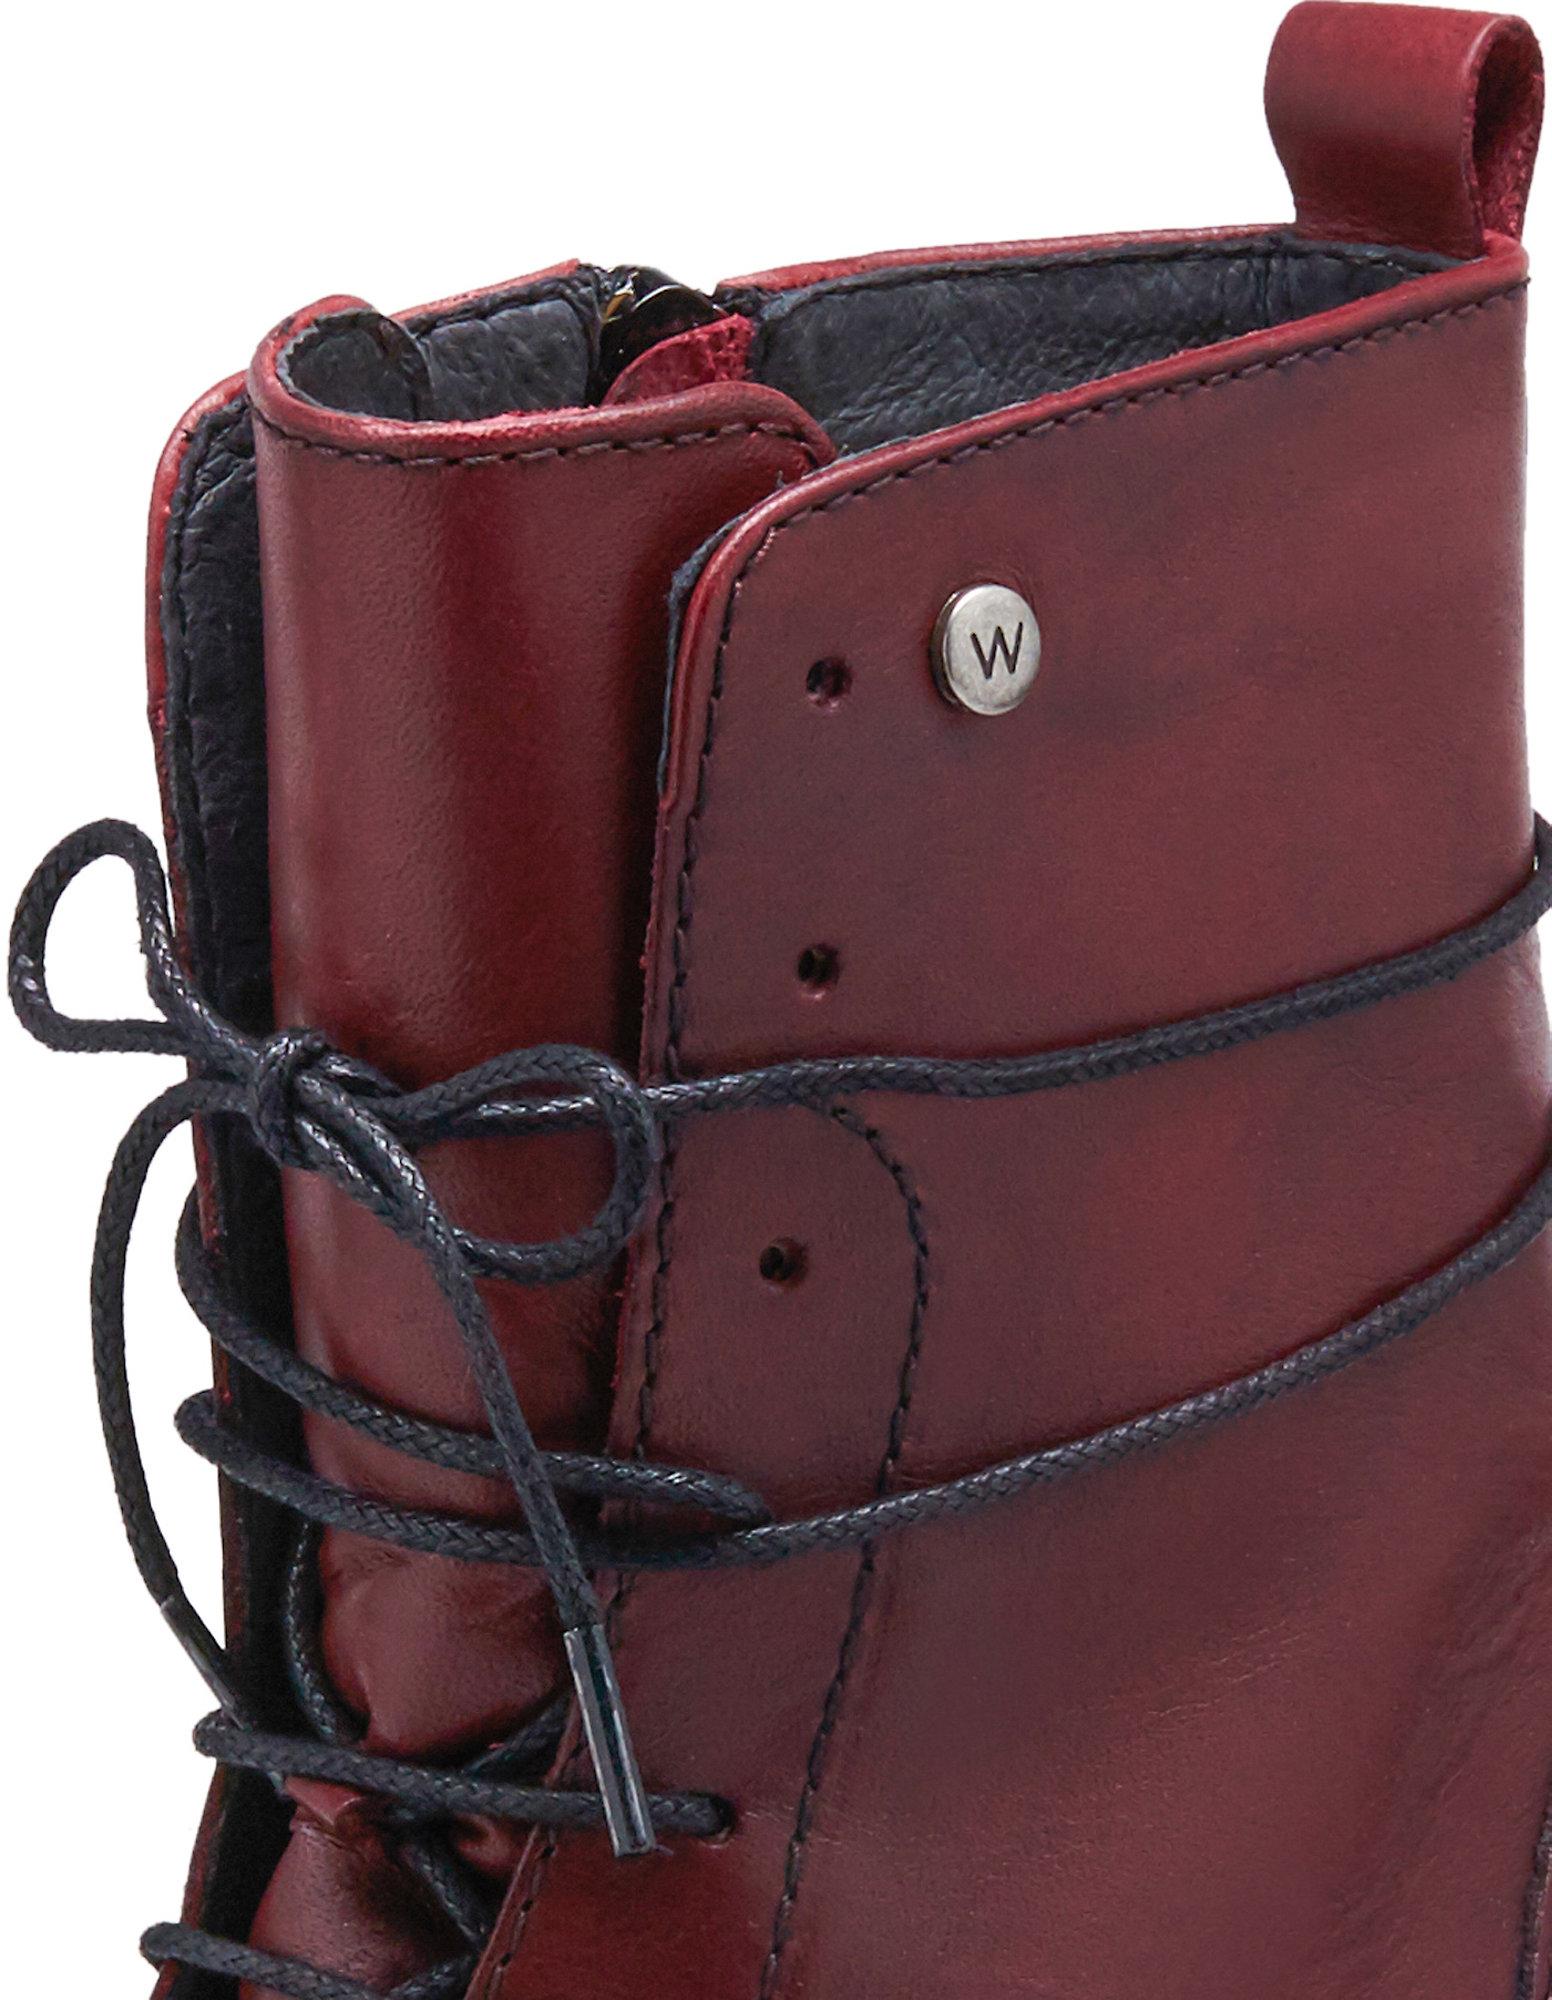 Stiefeletten Bering von Wolky in rot | Deerberg Kostenloser